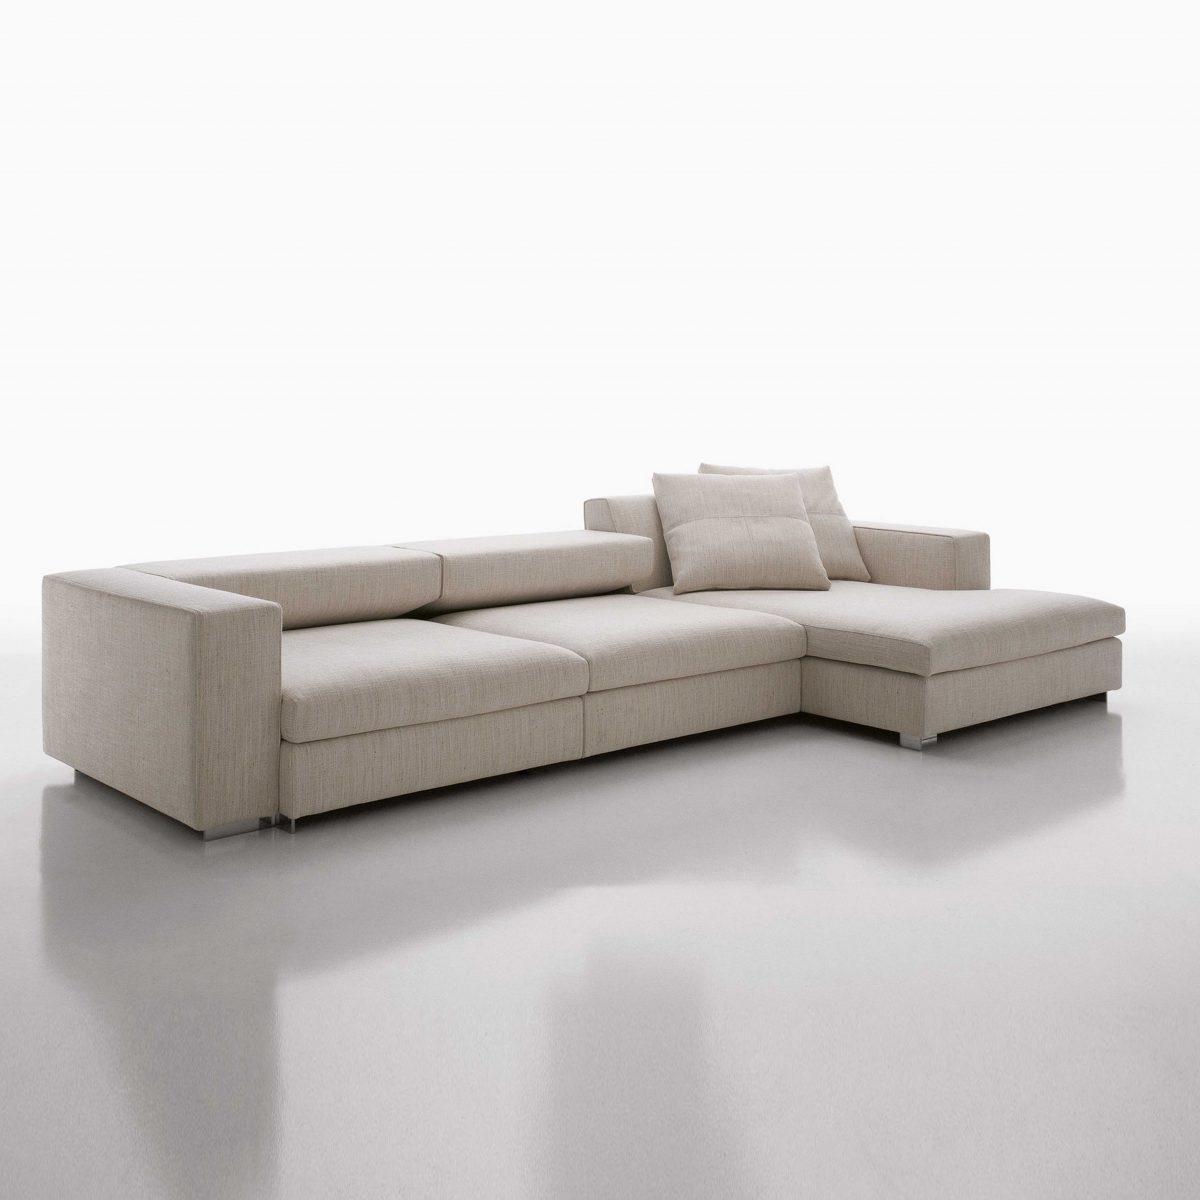 Turner Sofa | Molteni&C